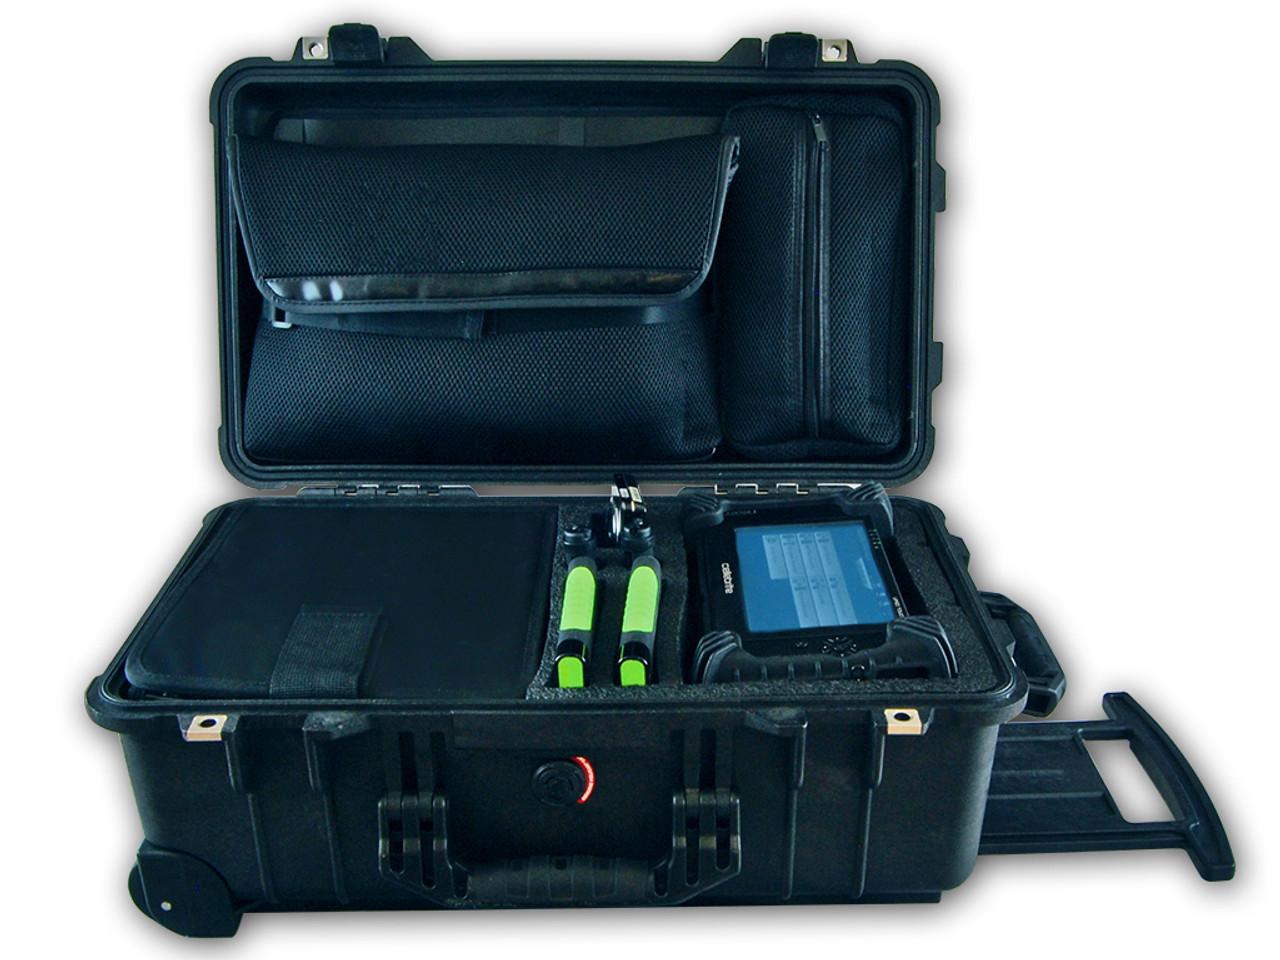 Momentum Mt400 Digital Forensics Mobile Triage Kit